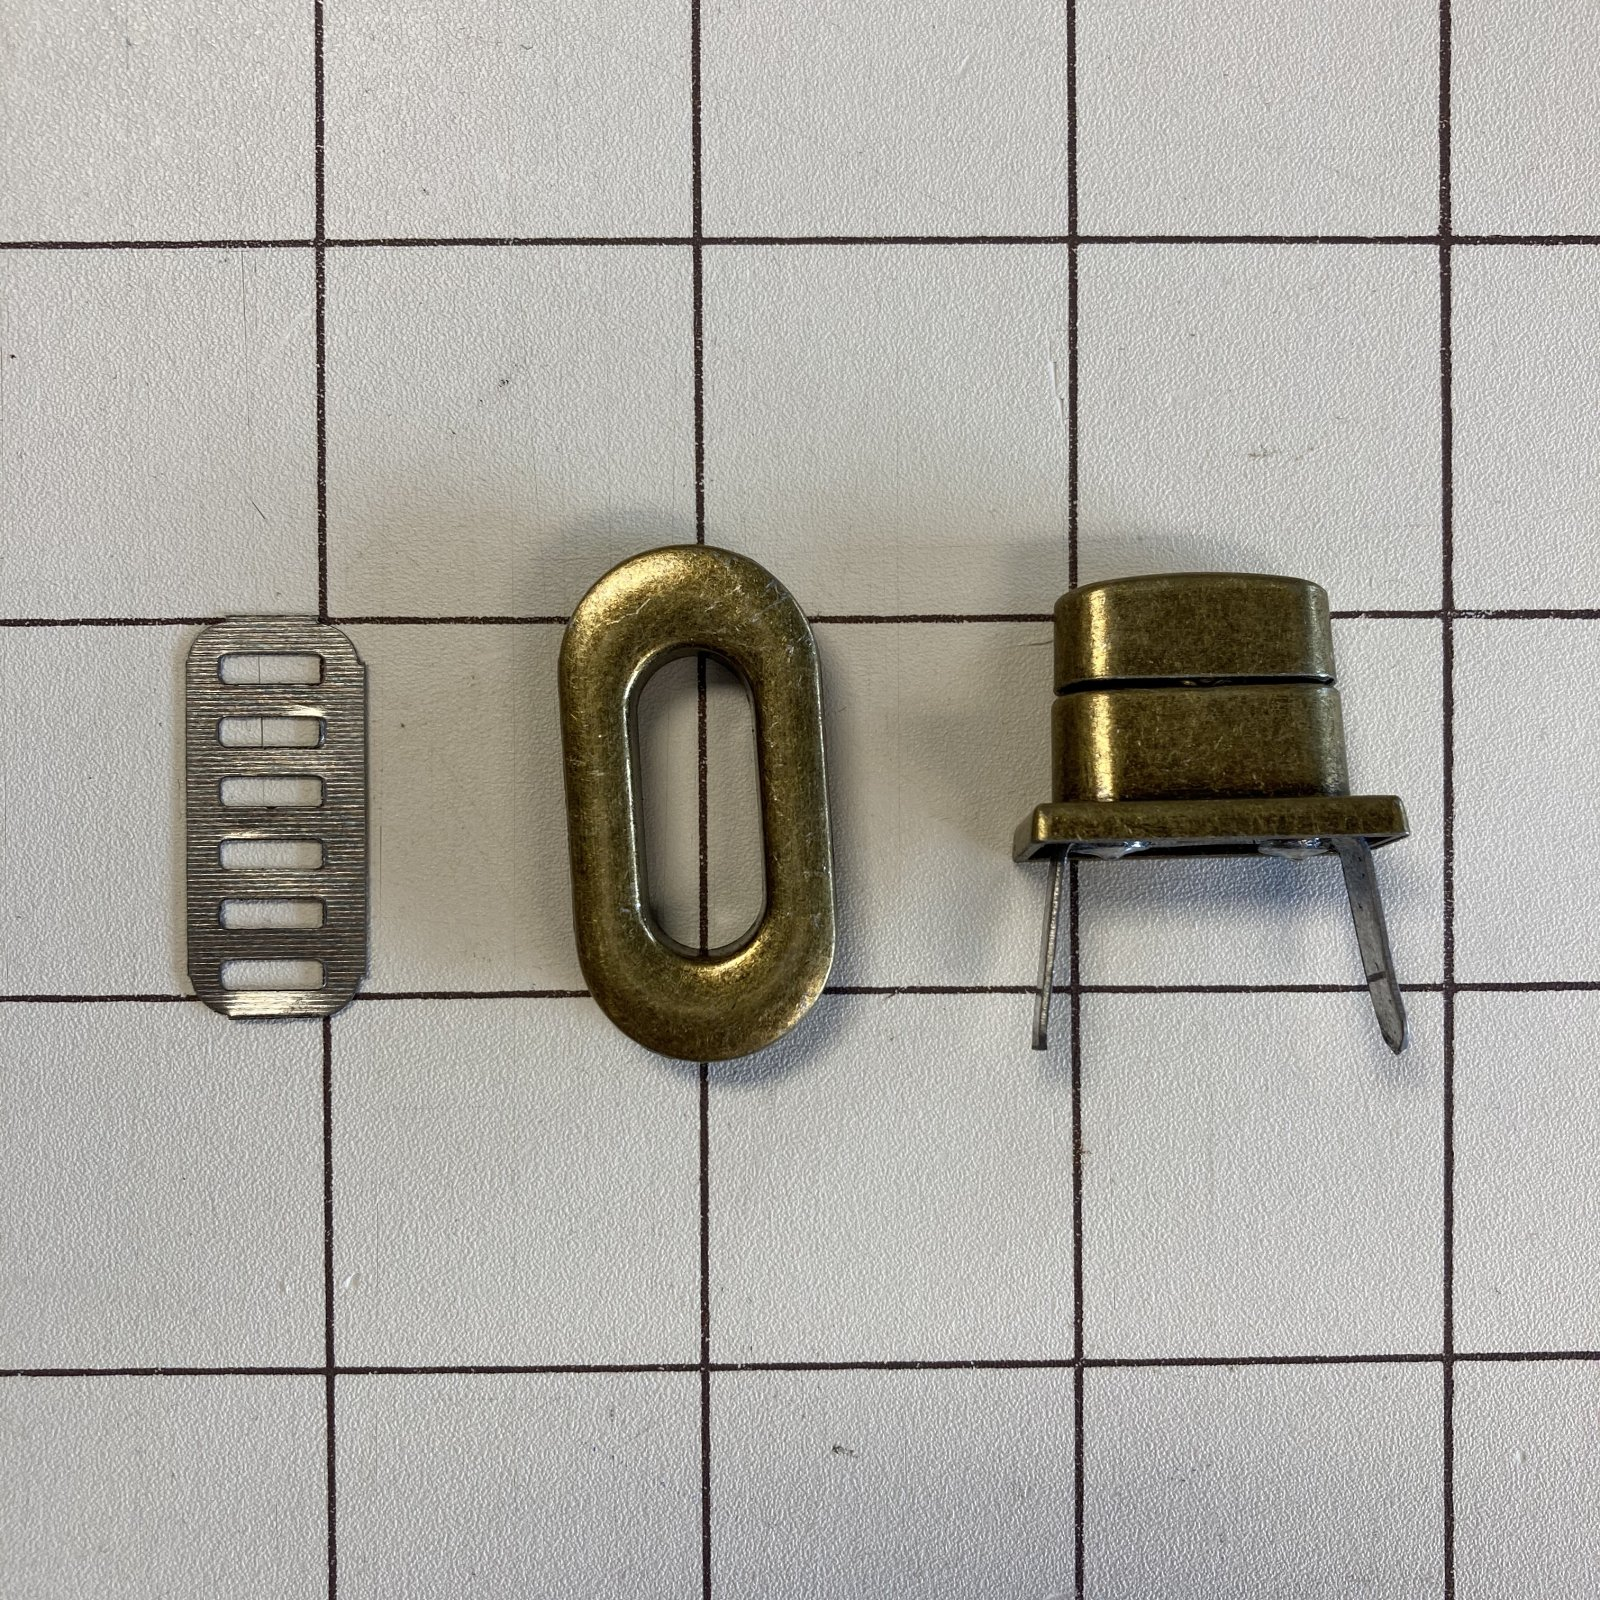 Sew Many Twist Lock Antique Brass